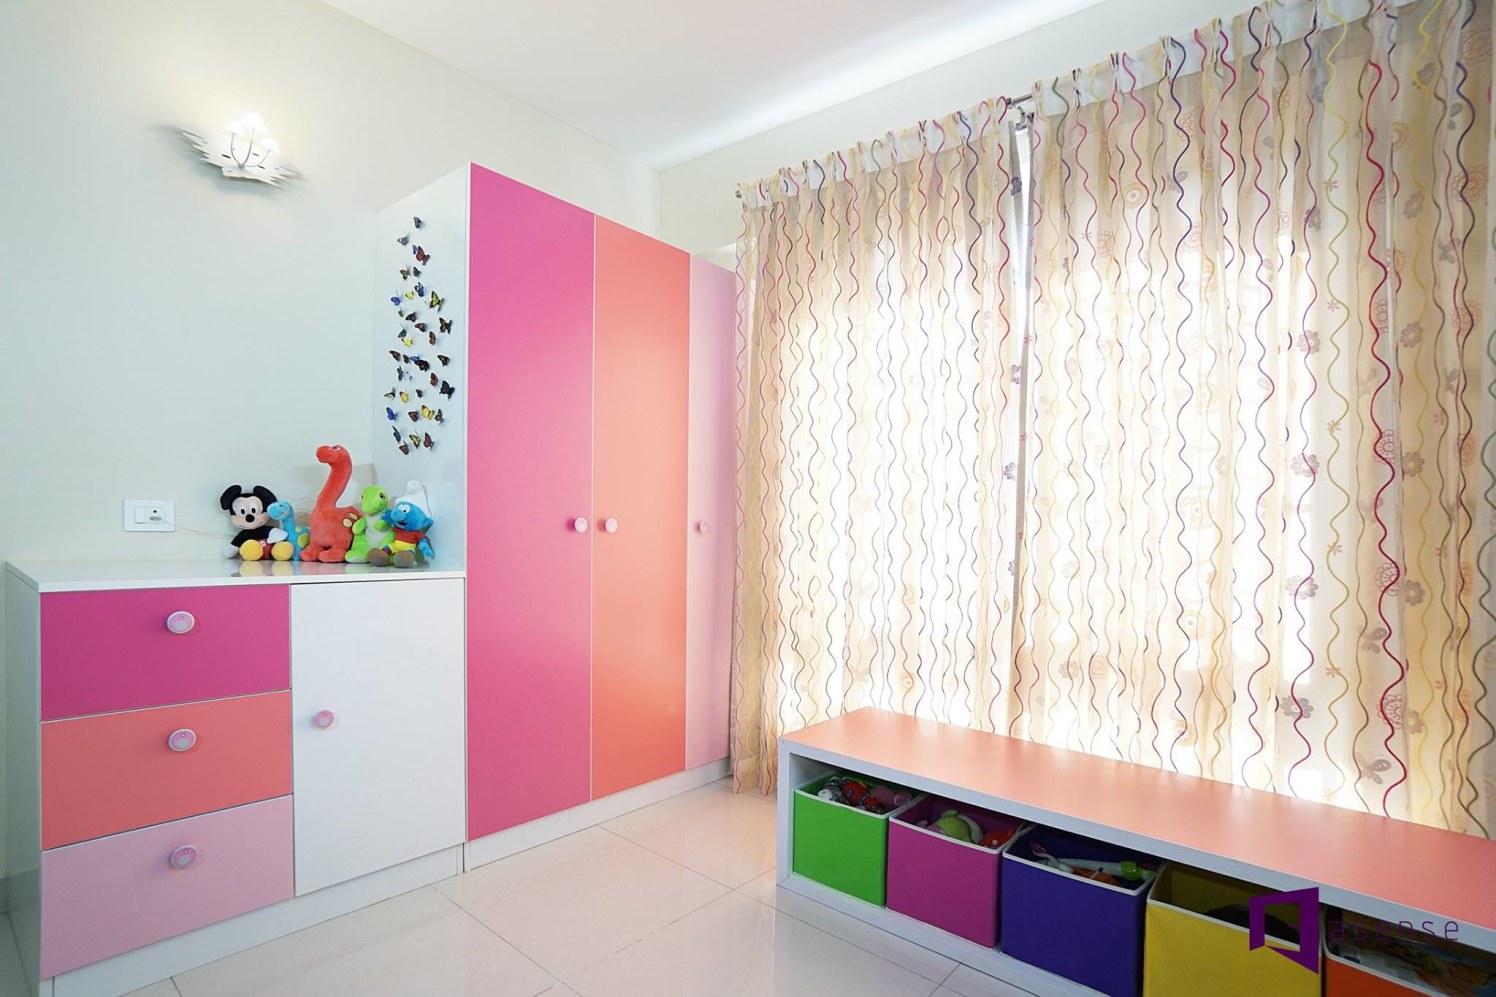 Pink ,Orange And Magenta  Wardrobe And Cabinets by Snigdha Ghosh Bedroom Contemporary | Interior Design Photos & Ideas